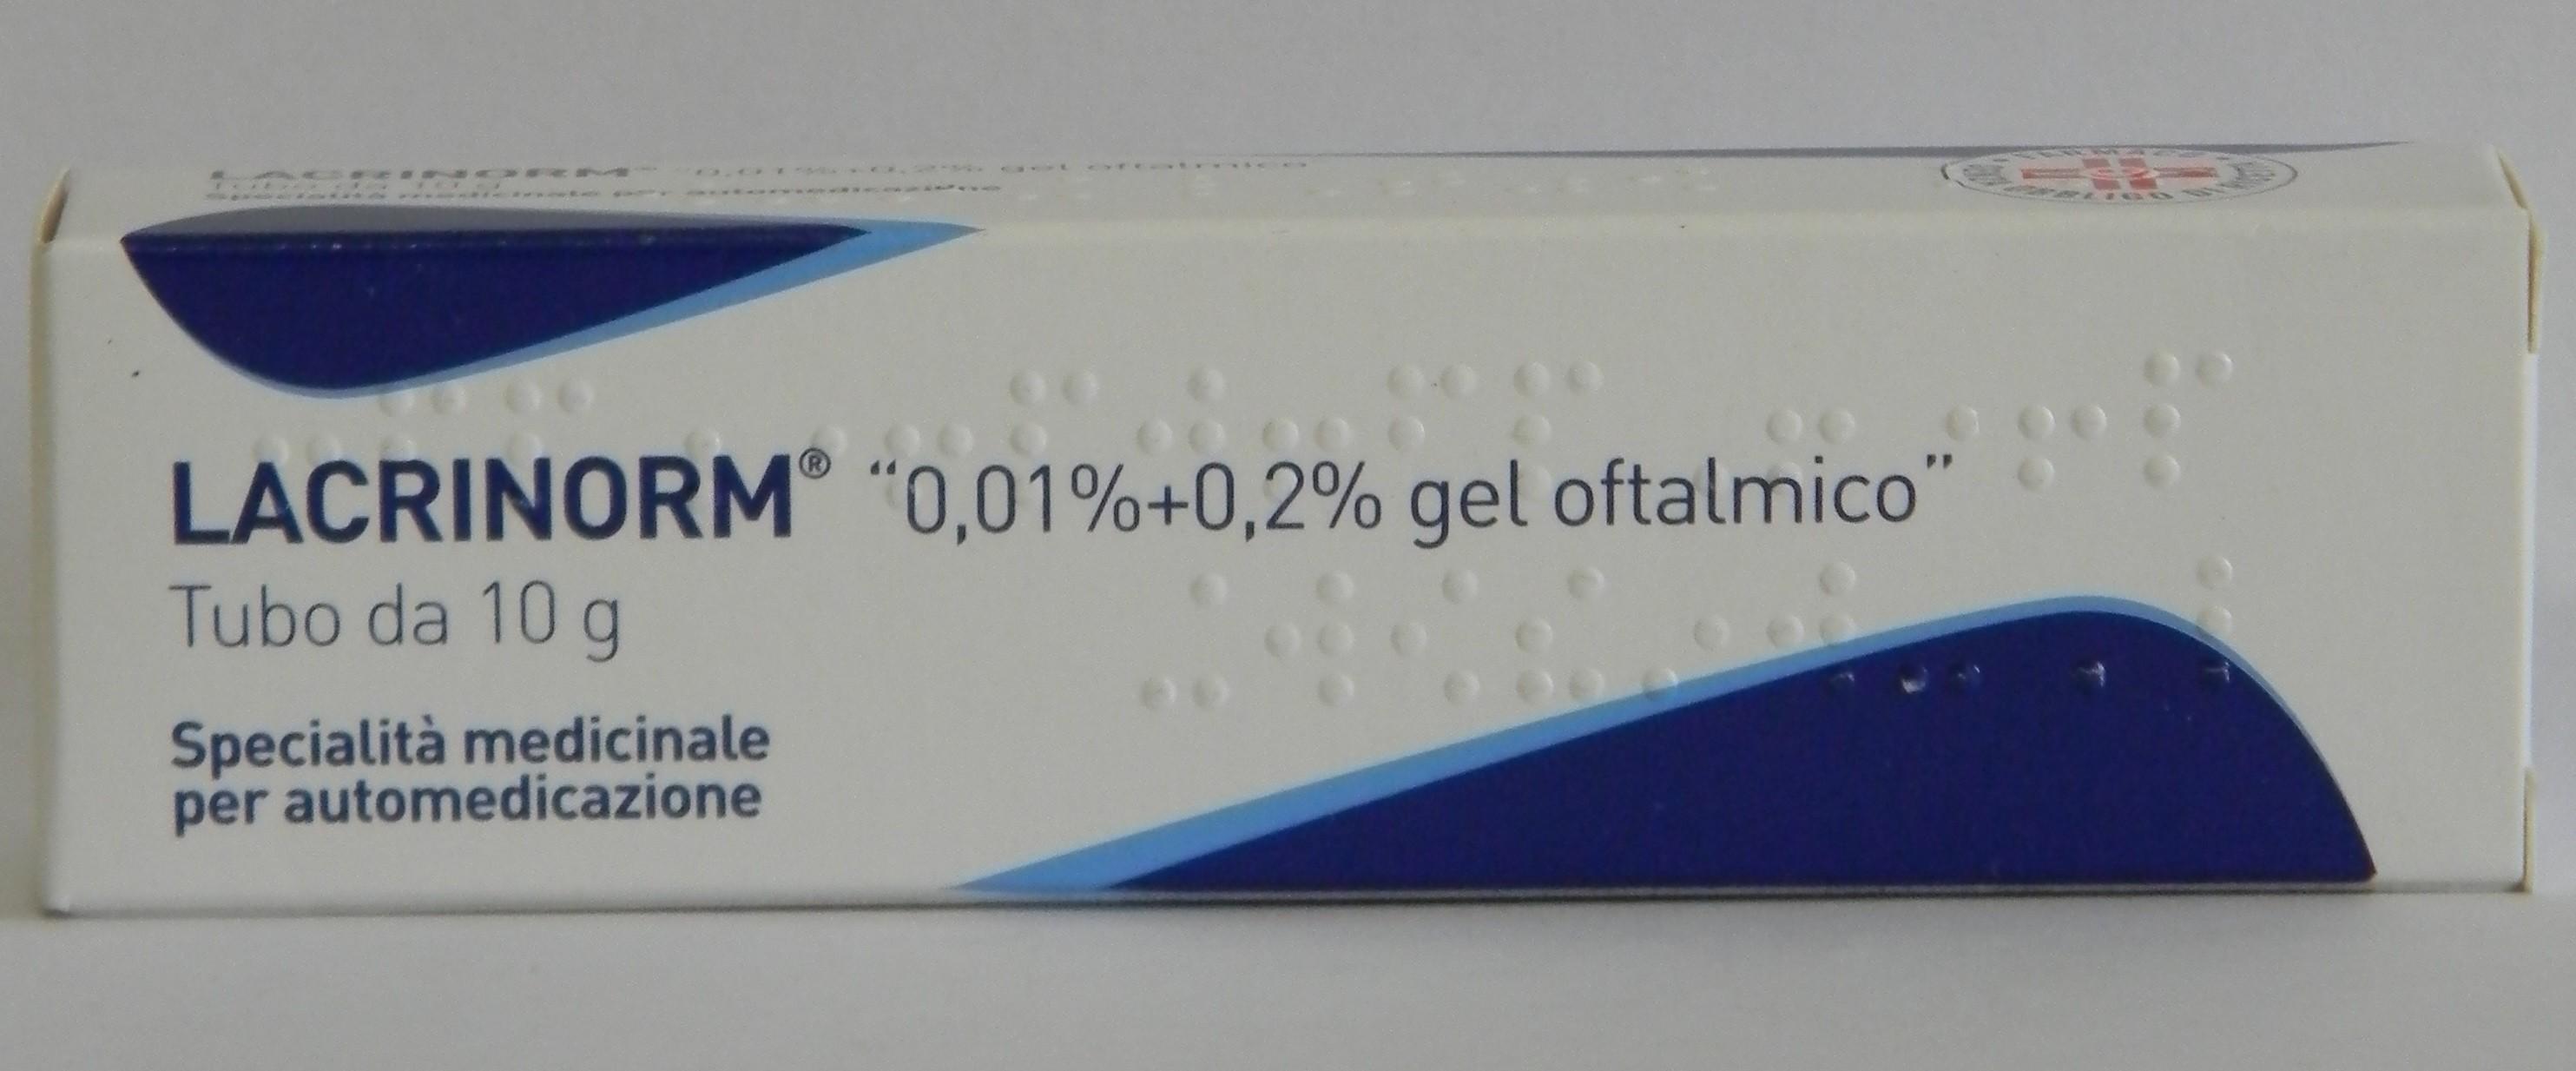 LACRINORM*GEL OFT 10G 0